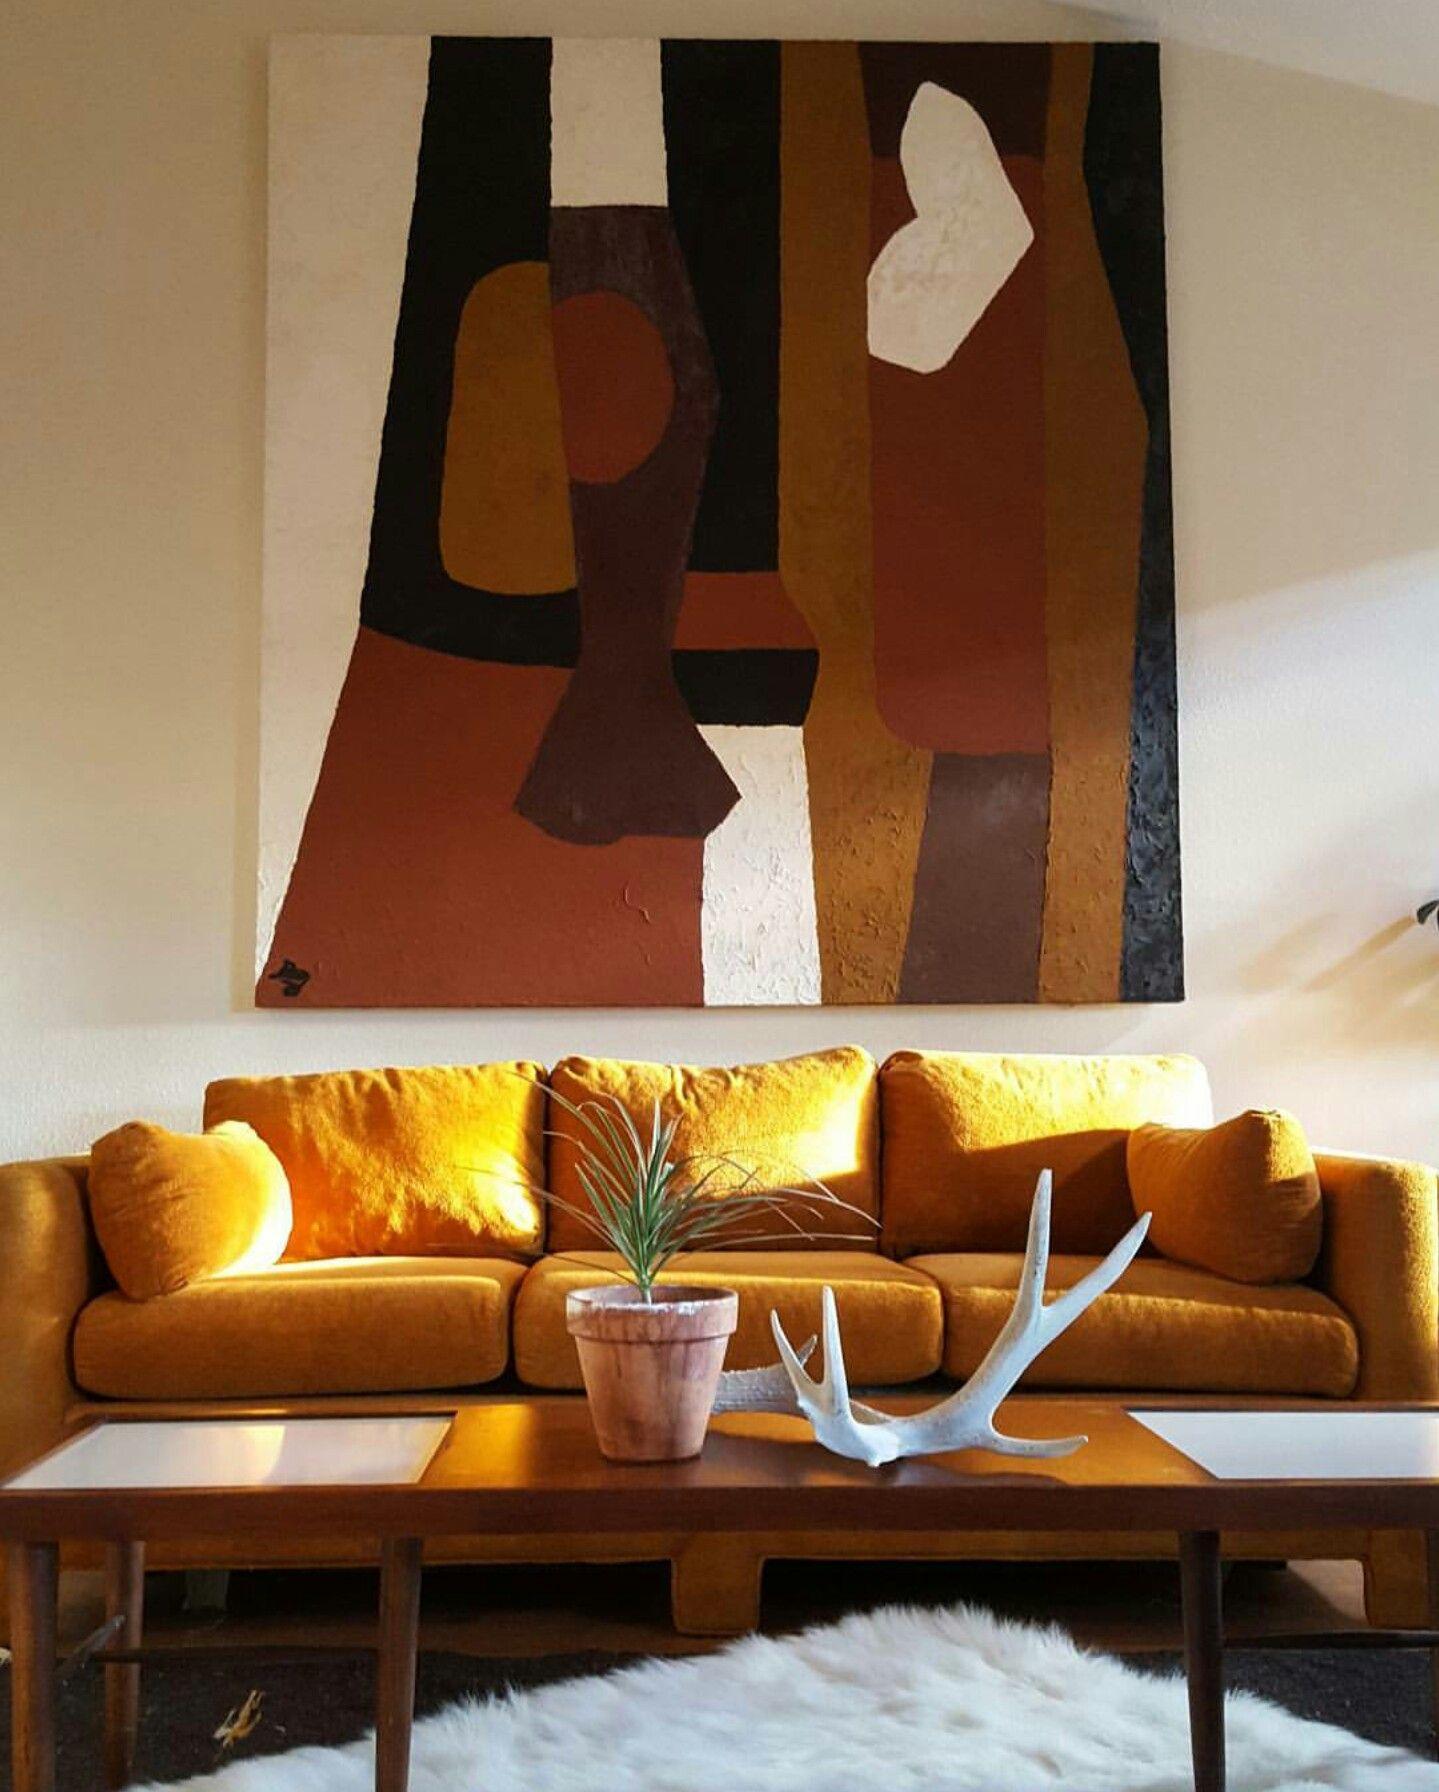 My Nest . #vintage #vintagestyle #midcentury #70s #60s #nest #abode #interiors #interiorstyling #decor #styling #art #artgoals